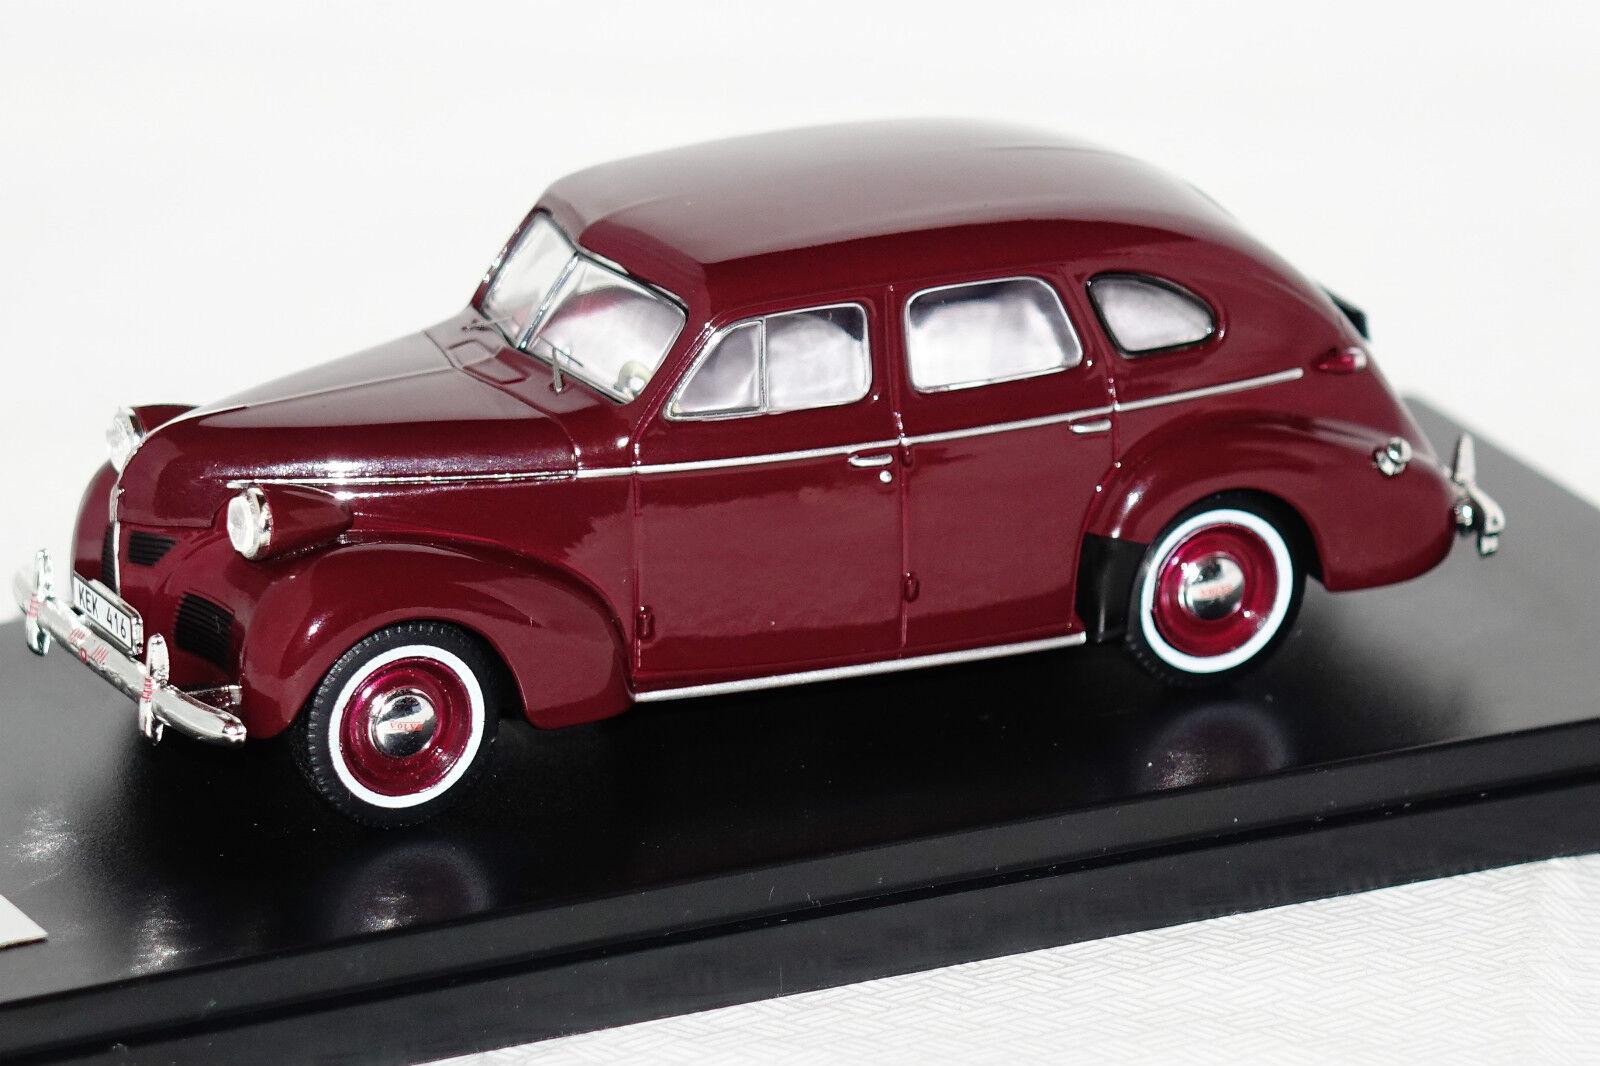 Volvo pv60 1947 Maroon rojo 1 43 Premiumx nuevo con embalaje original prd436